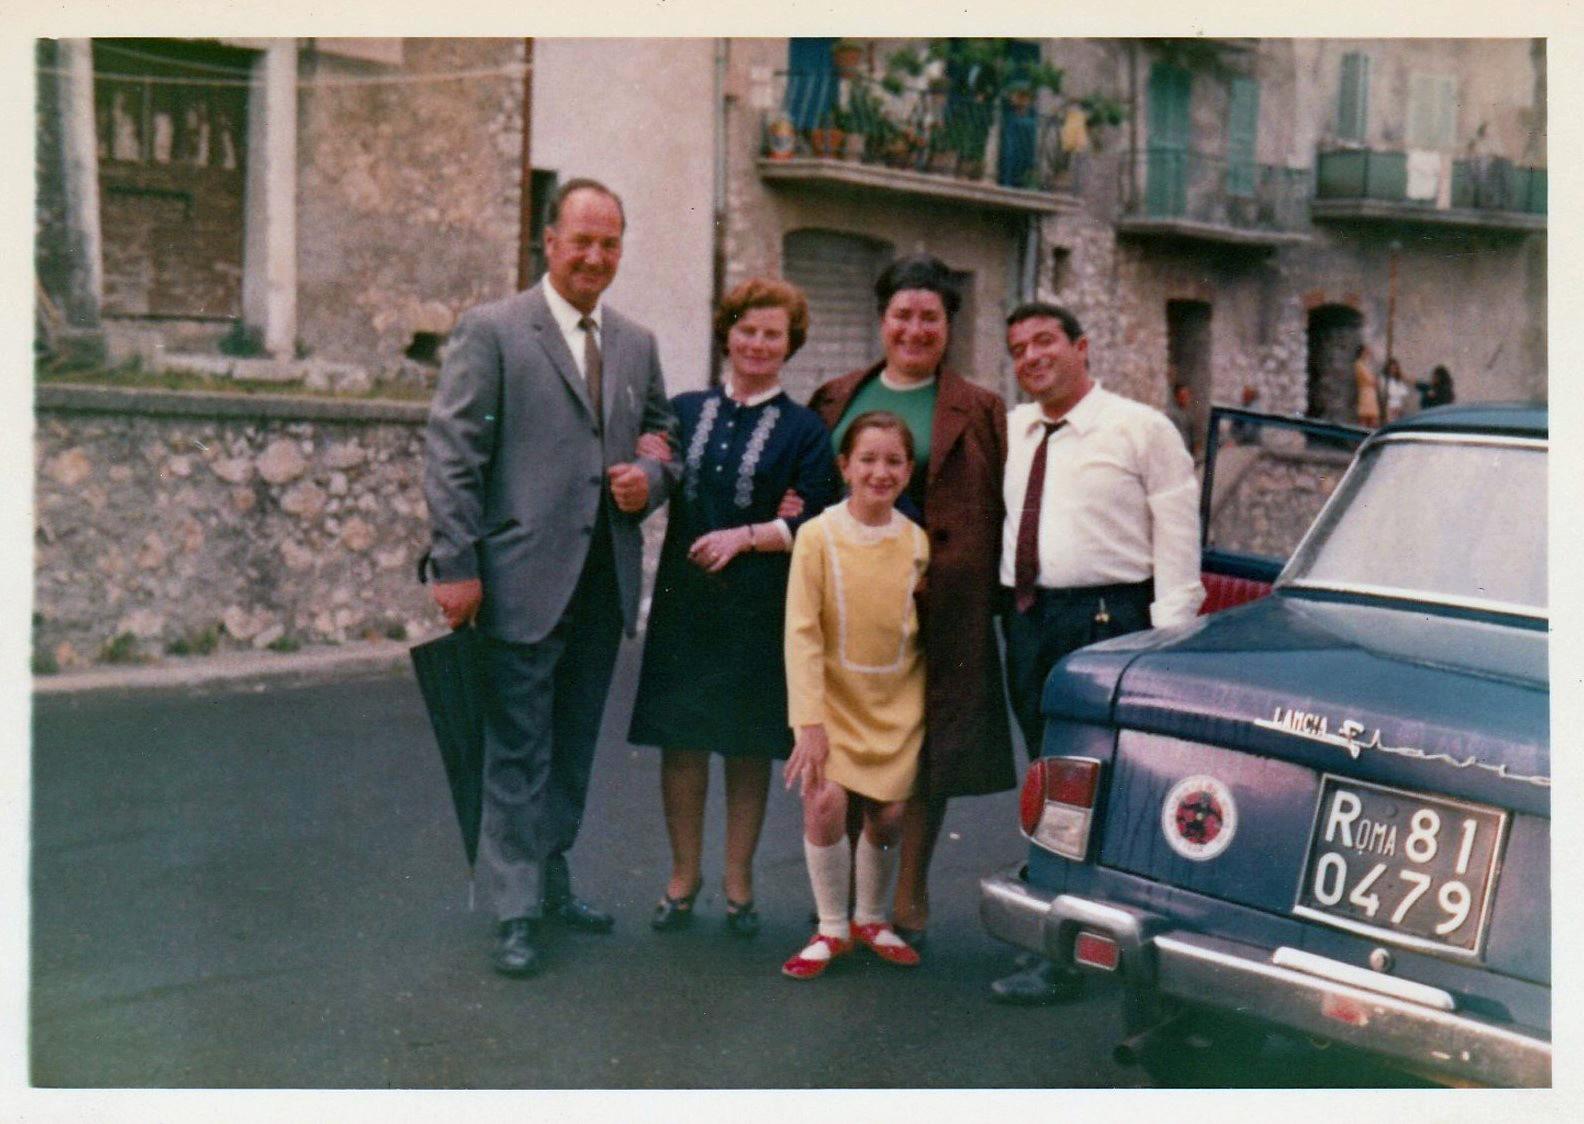 Lancia Flavia Photo